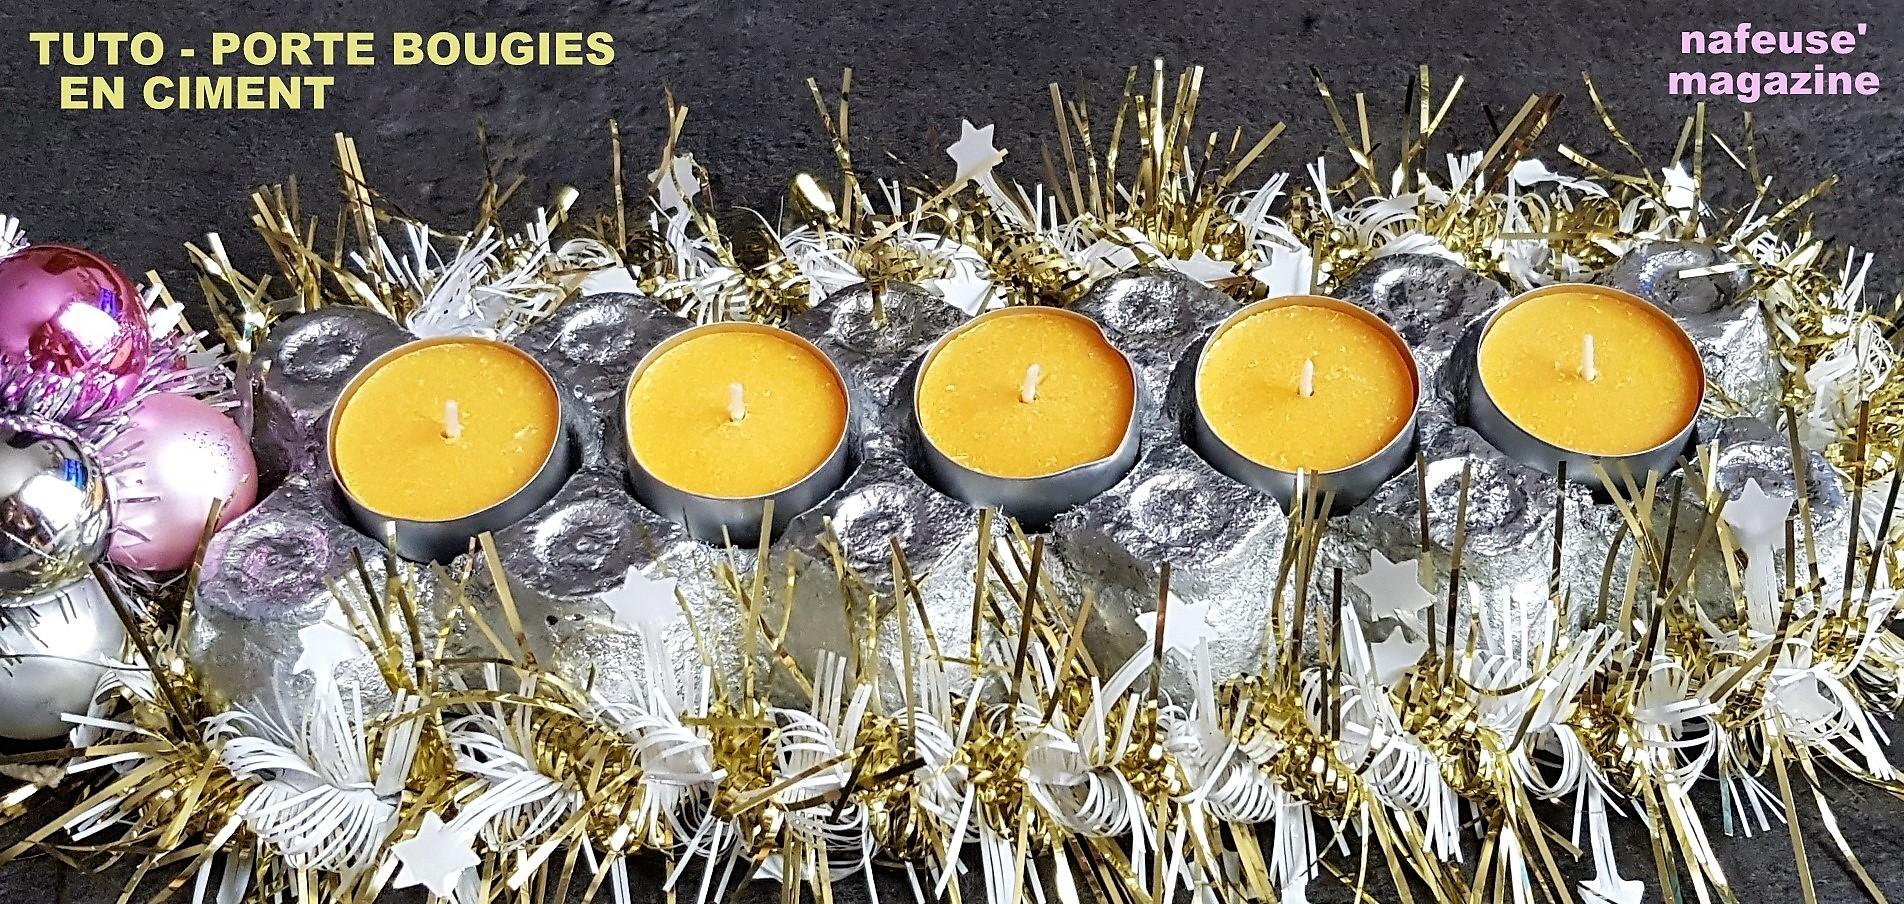 TUTO porte bougies en ciment